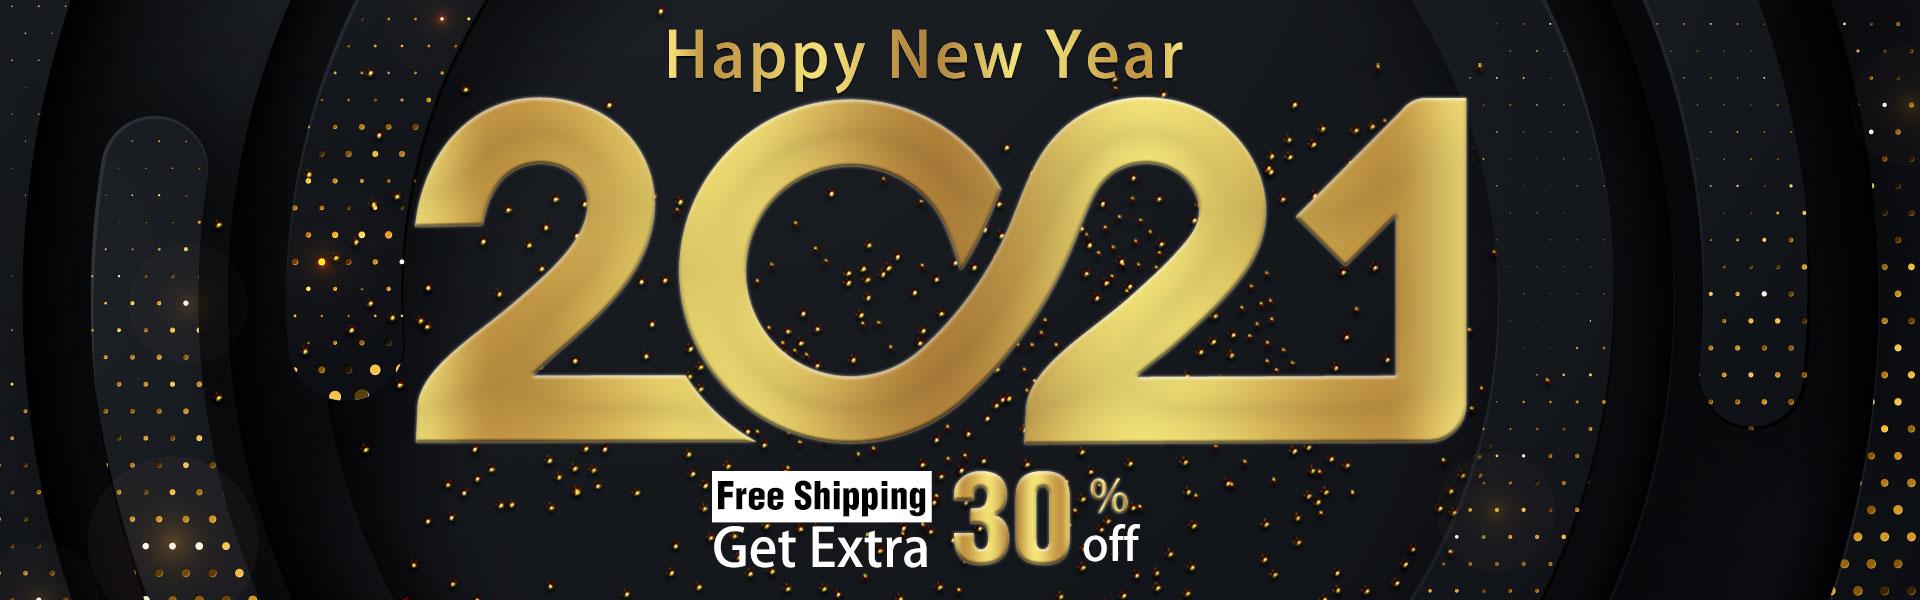 Happy New Year, Auto Parts 15% off